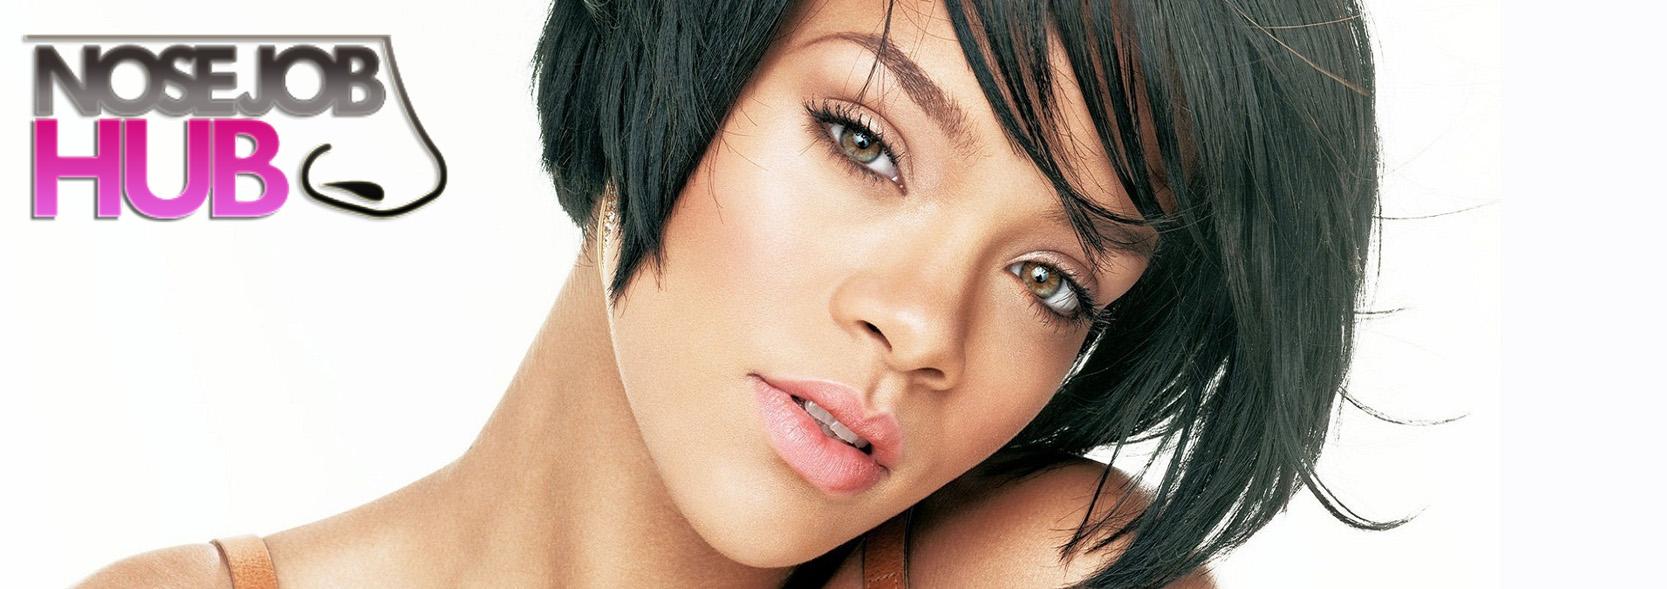 Rihanna Before and After Nose Job